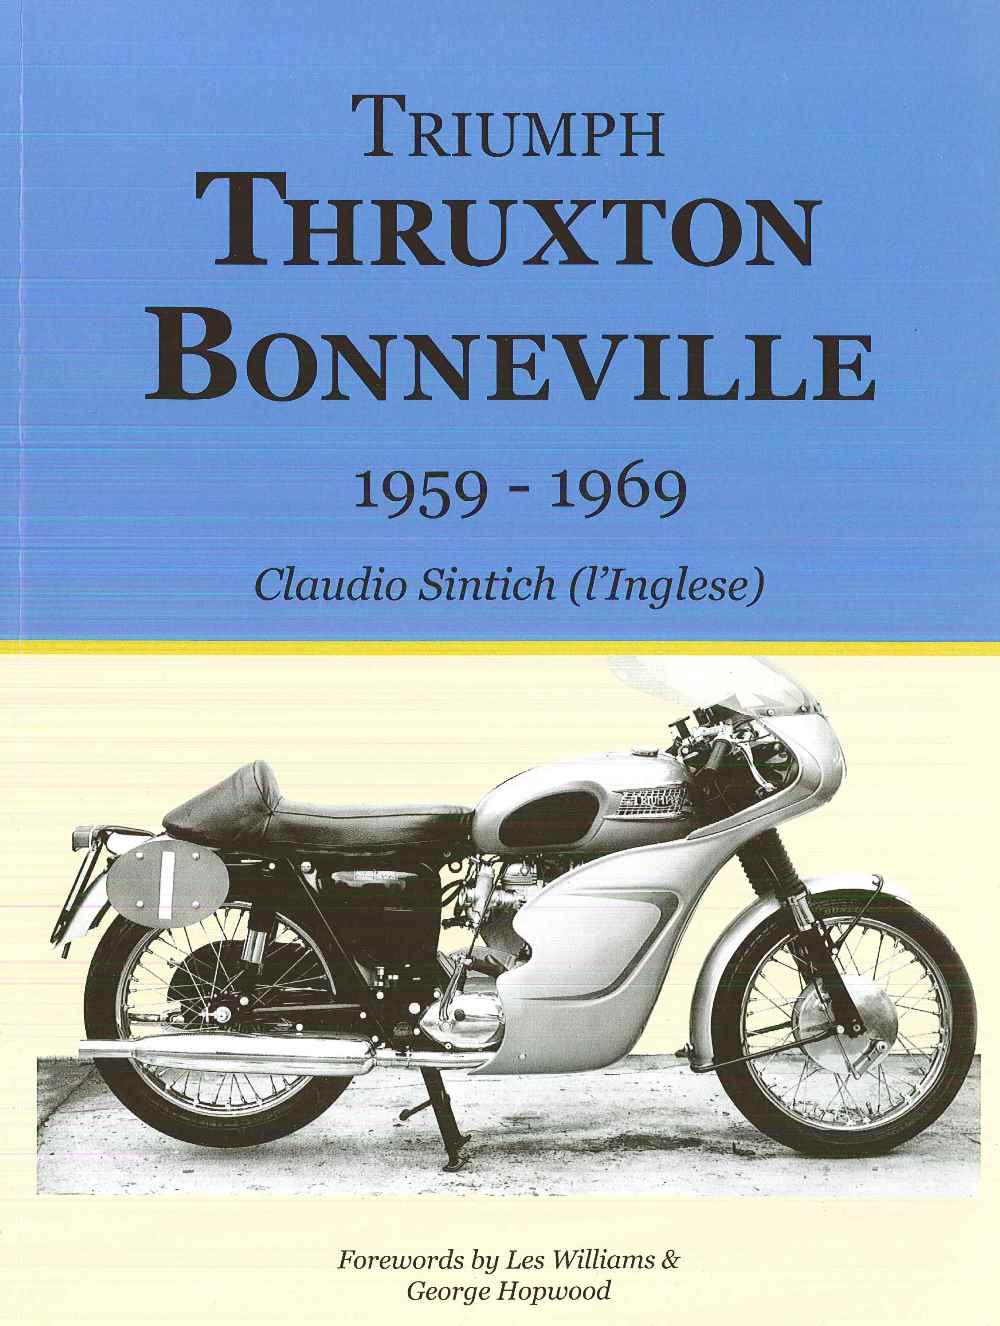 triumph thruxton bonneville 1959 1969 national motorcycle museum rh nationalmotorcyclemuseum co uk Triumph Bonneville T120 Triumph Bonneville T120